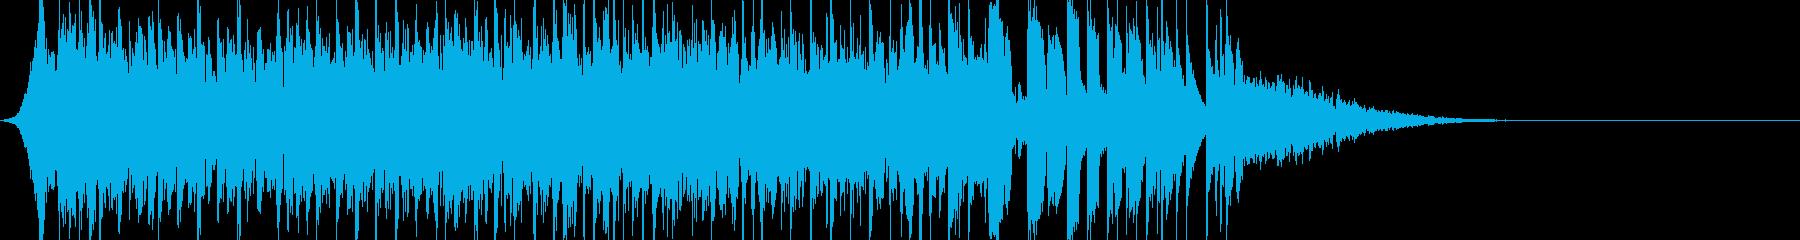 EDM風イントロ(インパクト系)です。の再生済みの波形